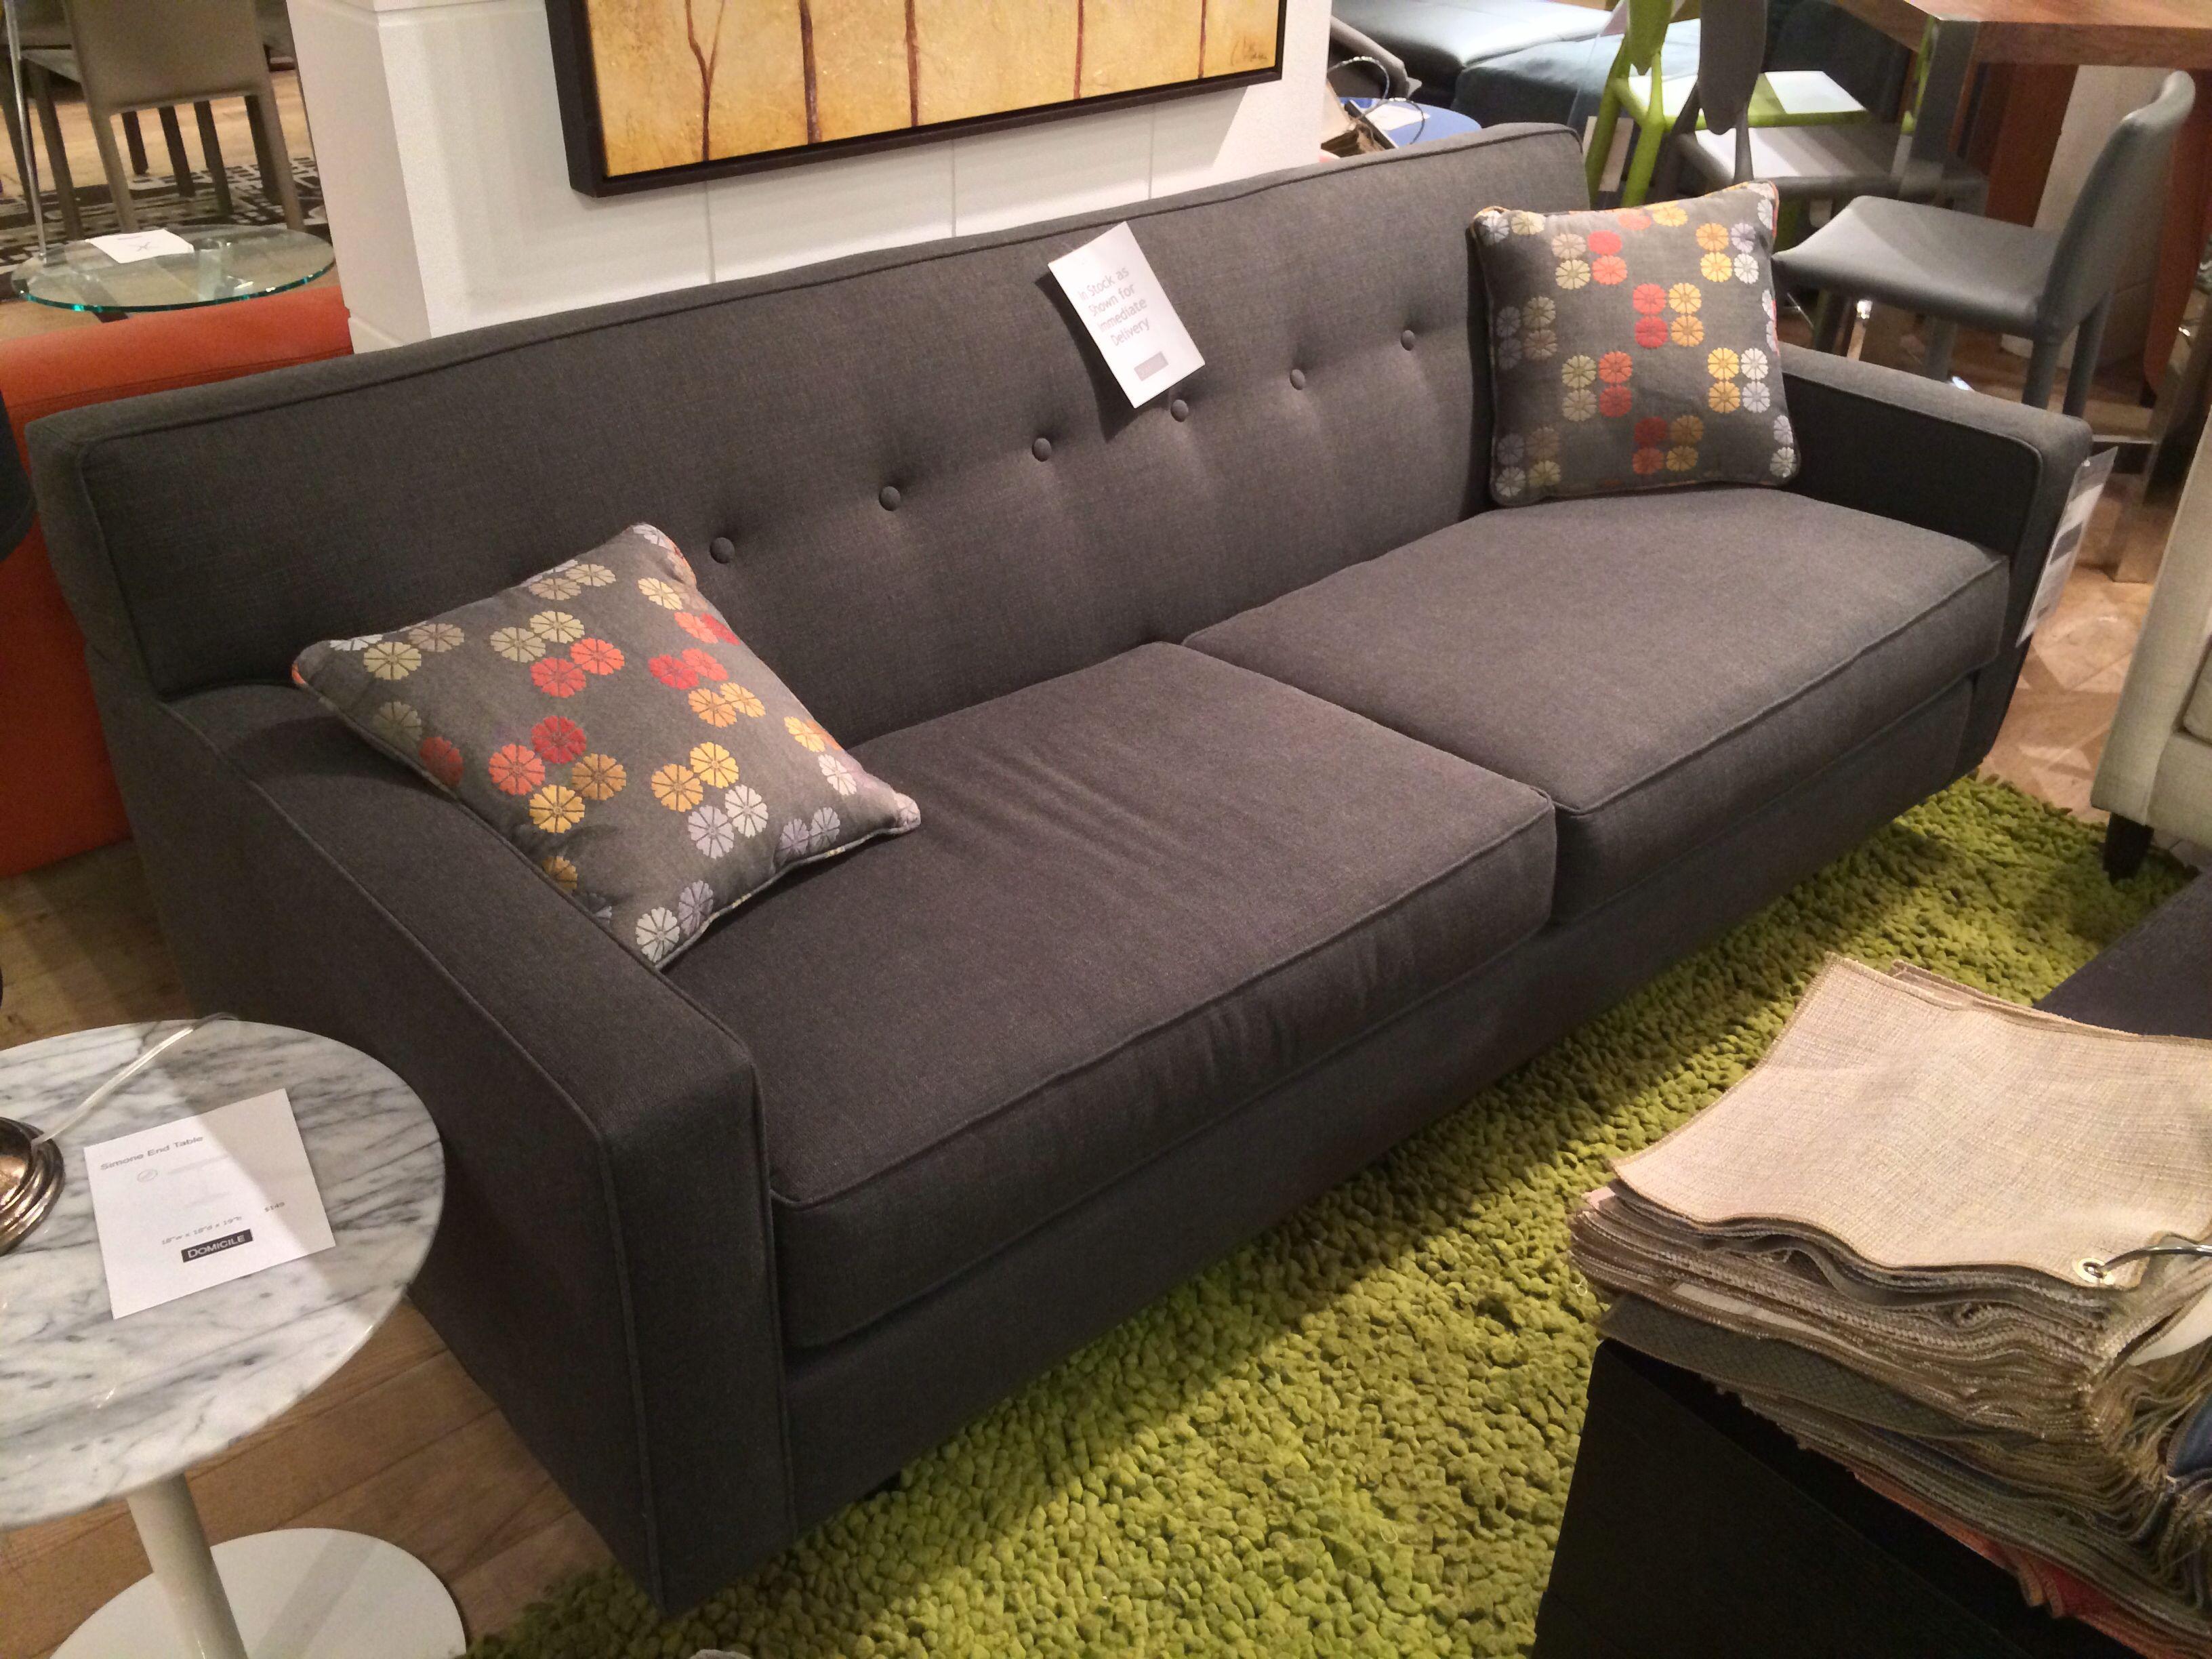 Dorset Sofa Domicile Furniture The 1501 Living Room